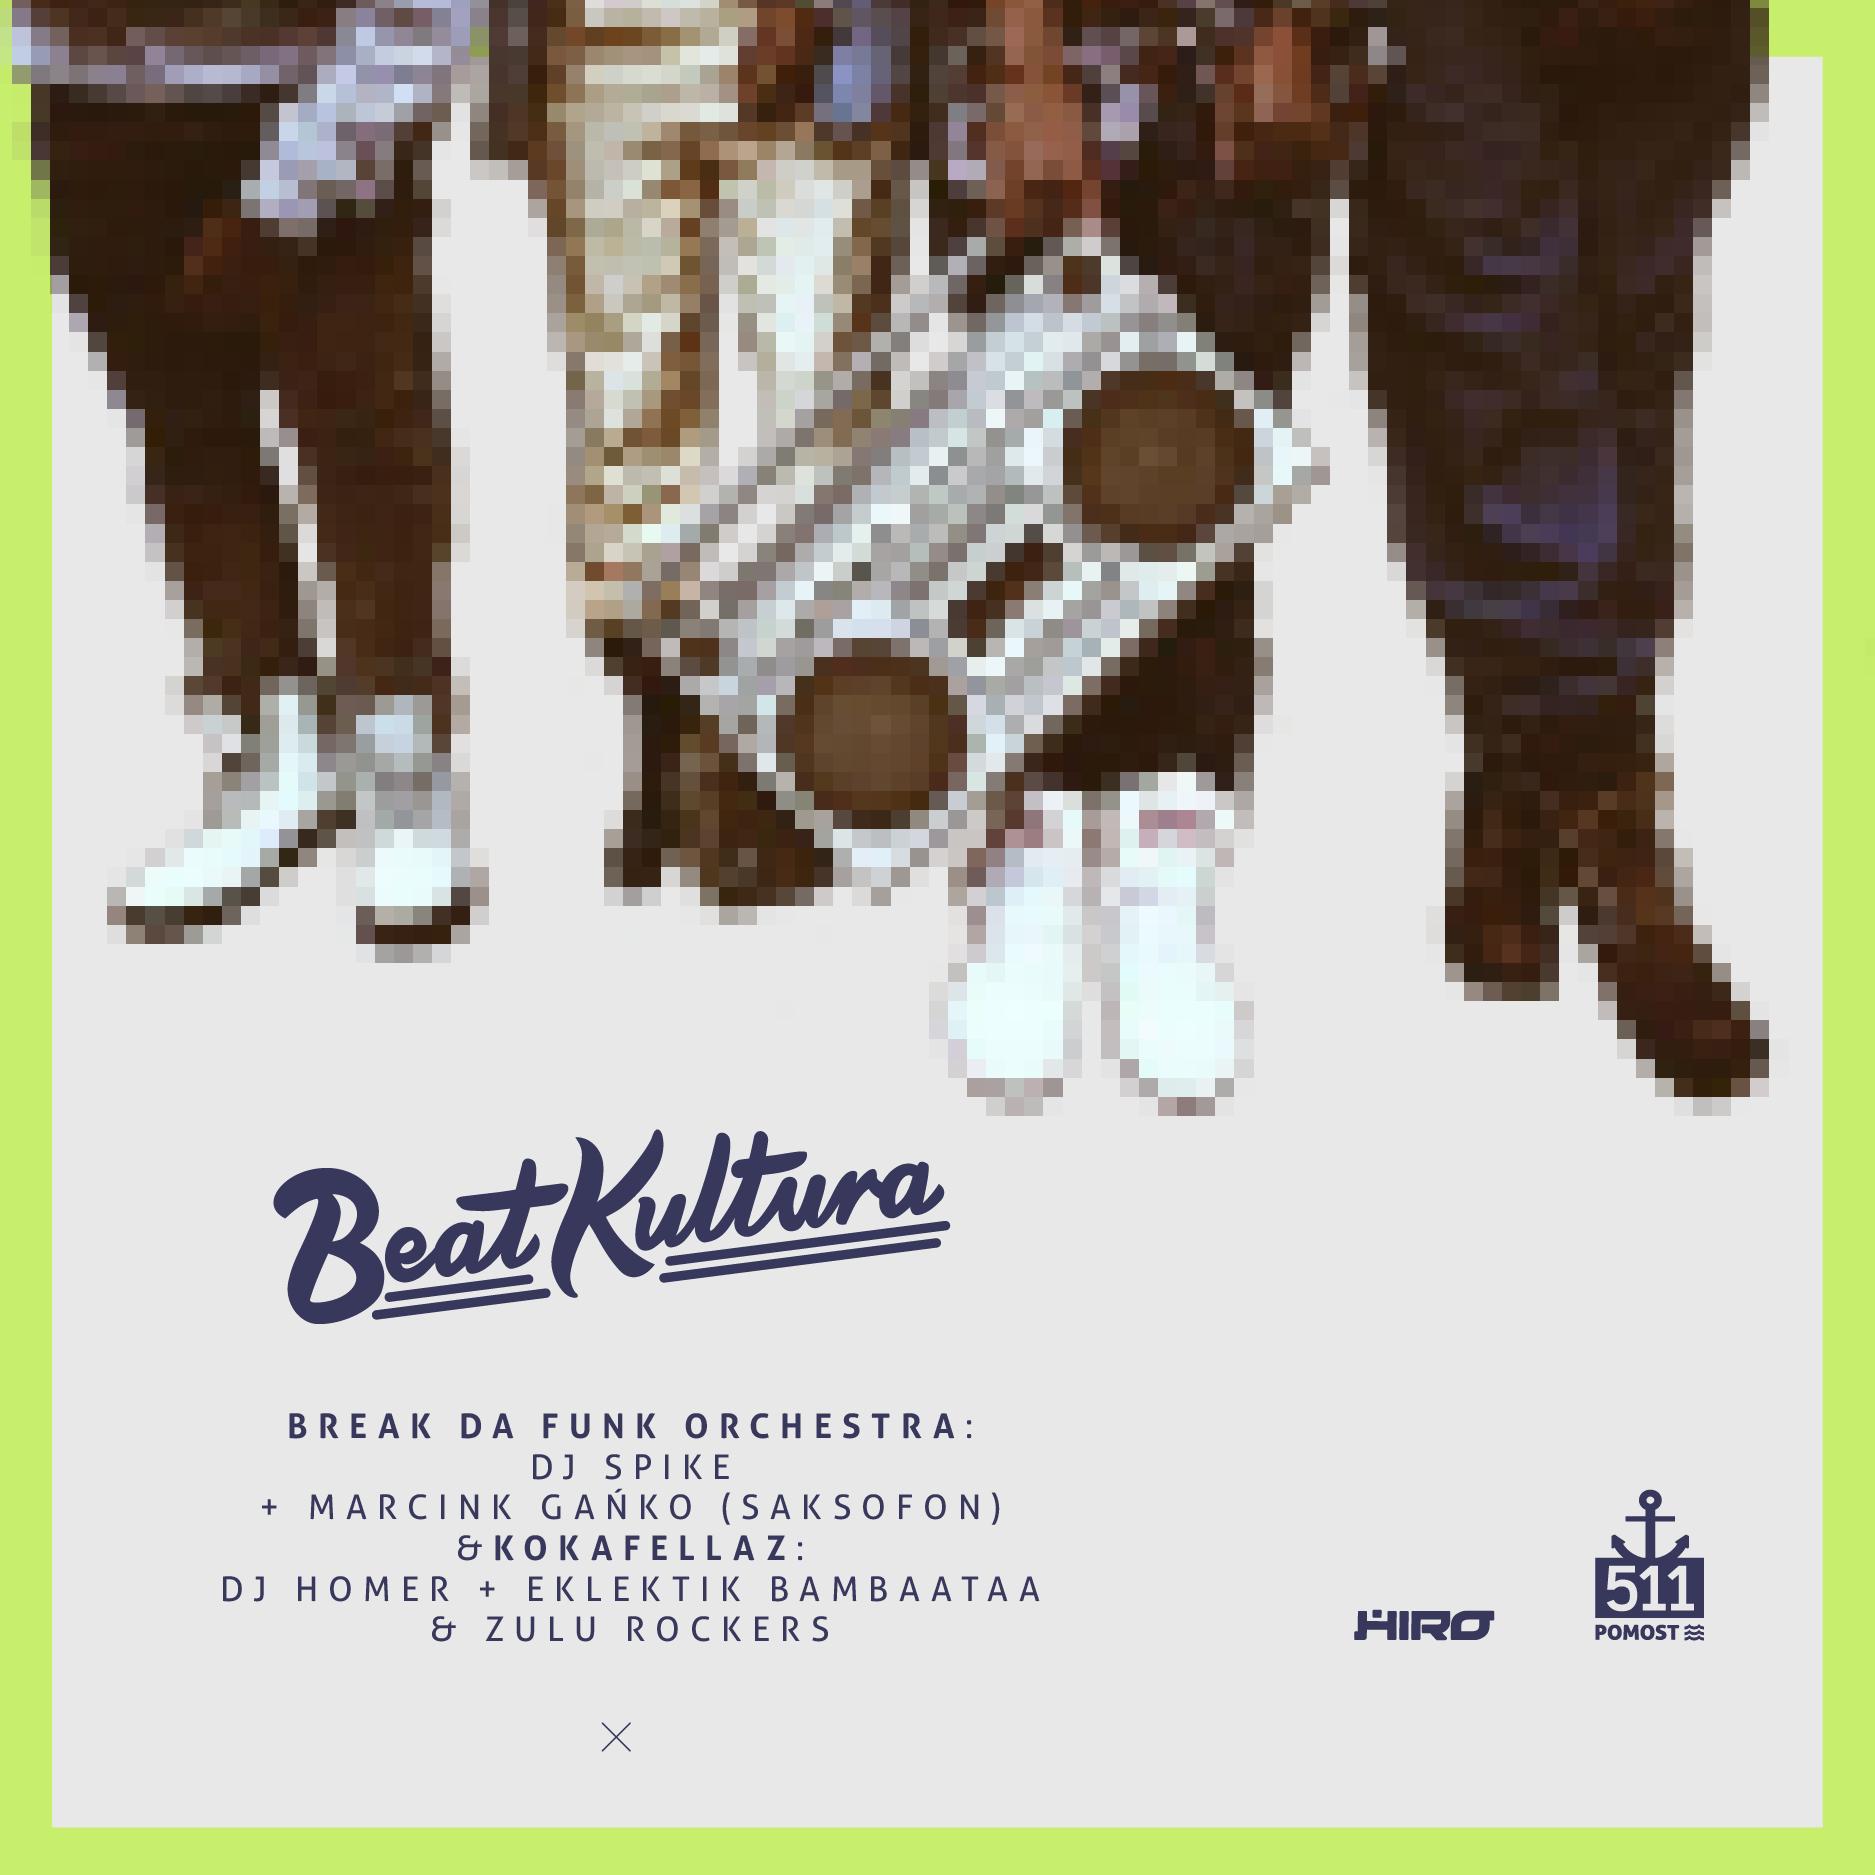 beatkultura_21.08_Insta